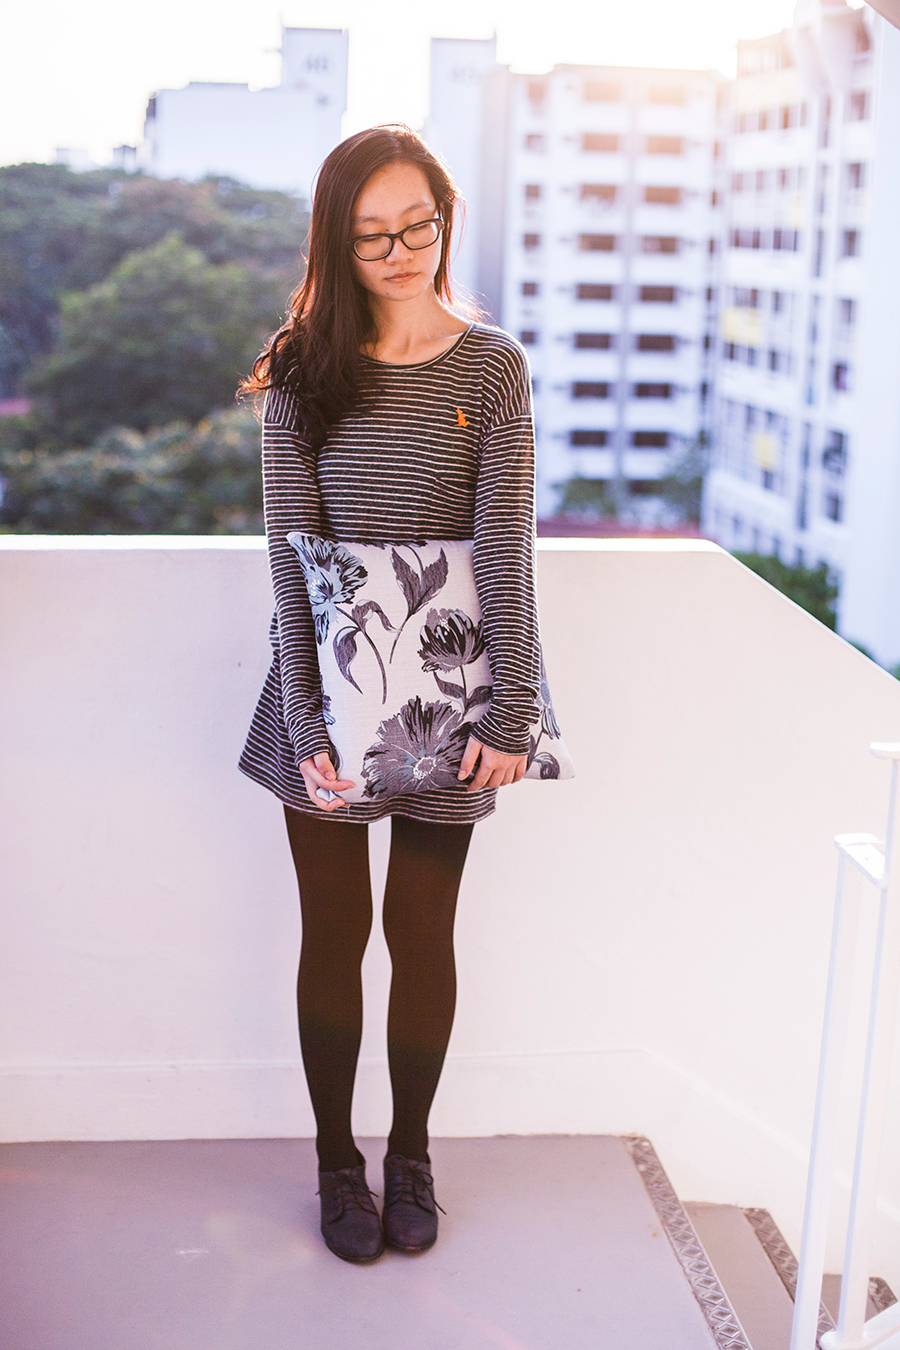 Outfit details: Zara striped tunic dress, Forever 21 black tights, Taobao navy blue oxford heels, Vintage wooden kangaroo pin, Gap black rimmed glasses.